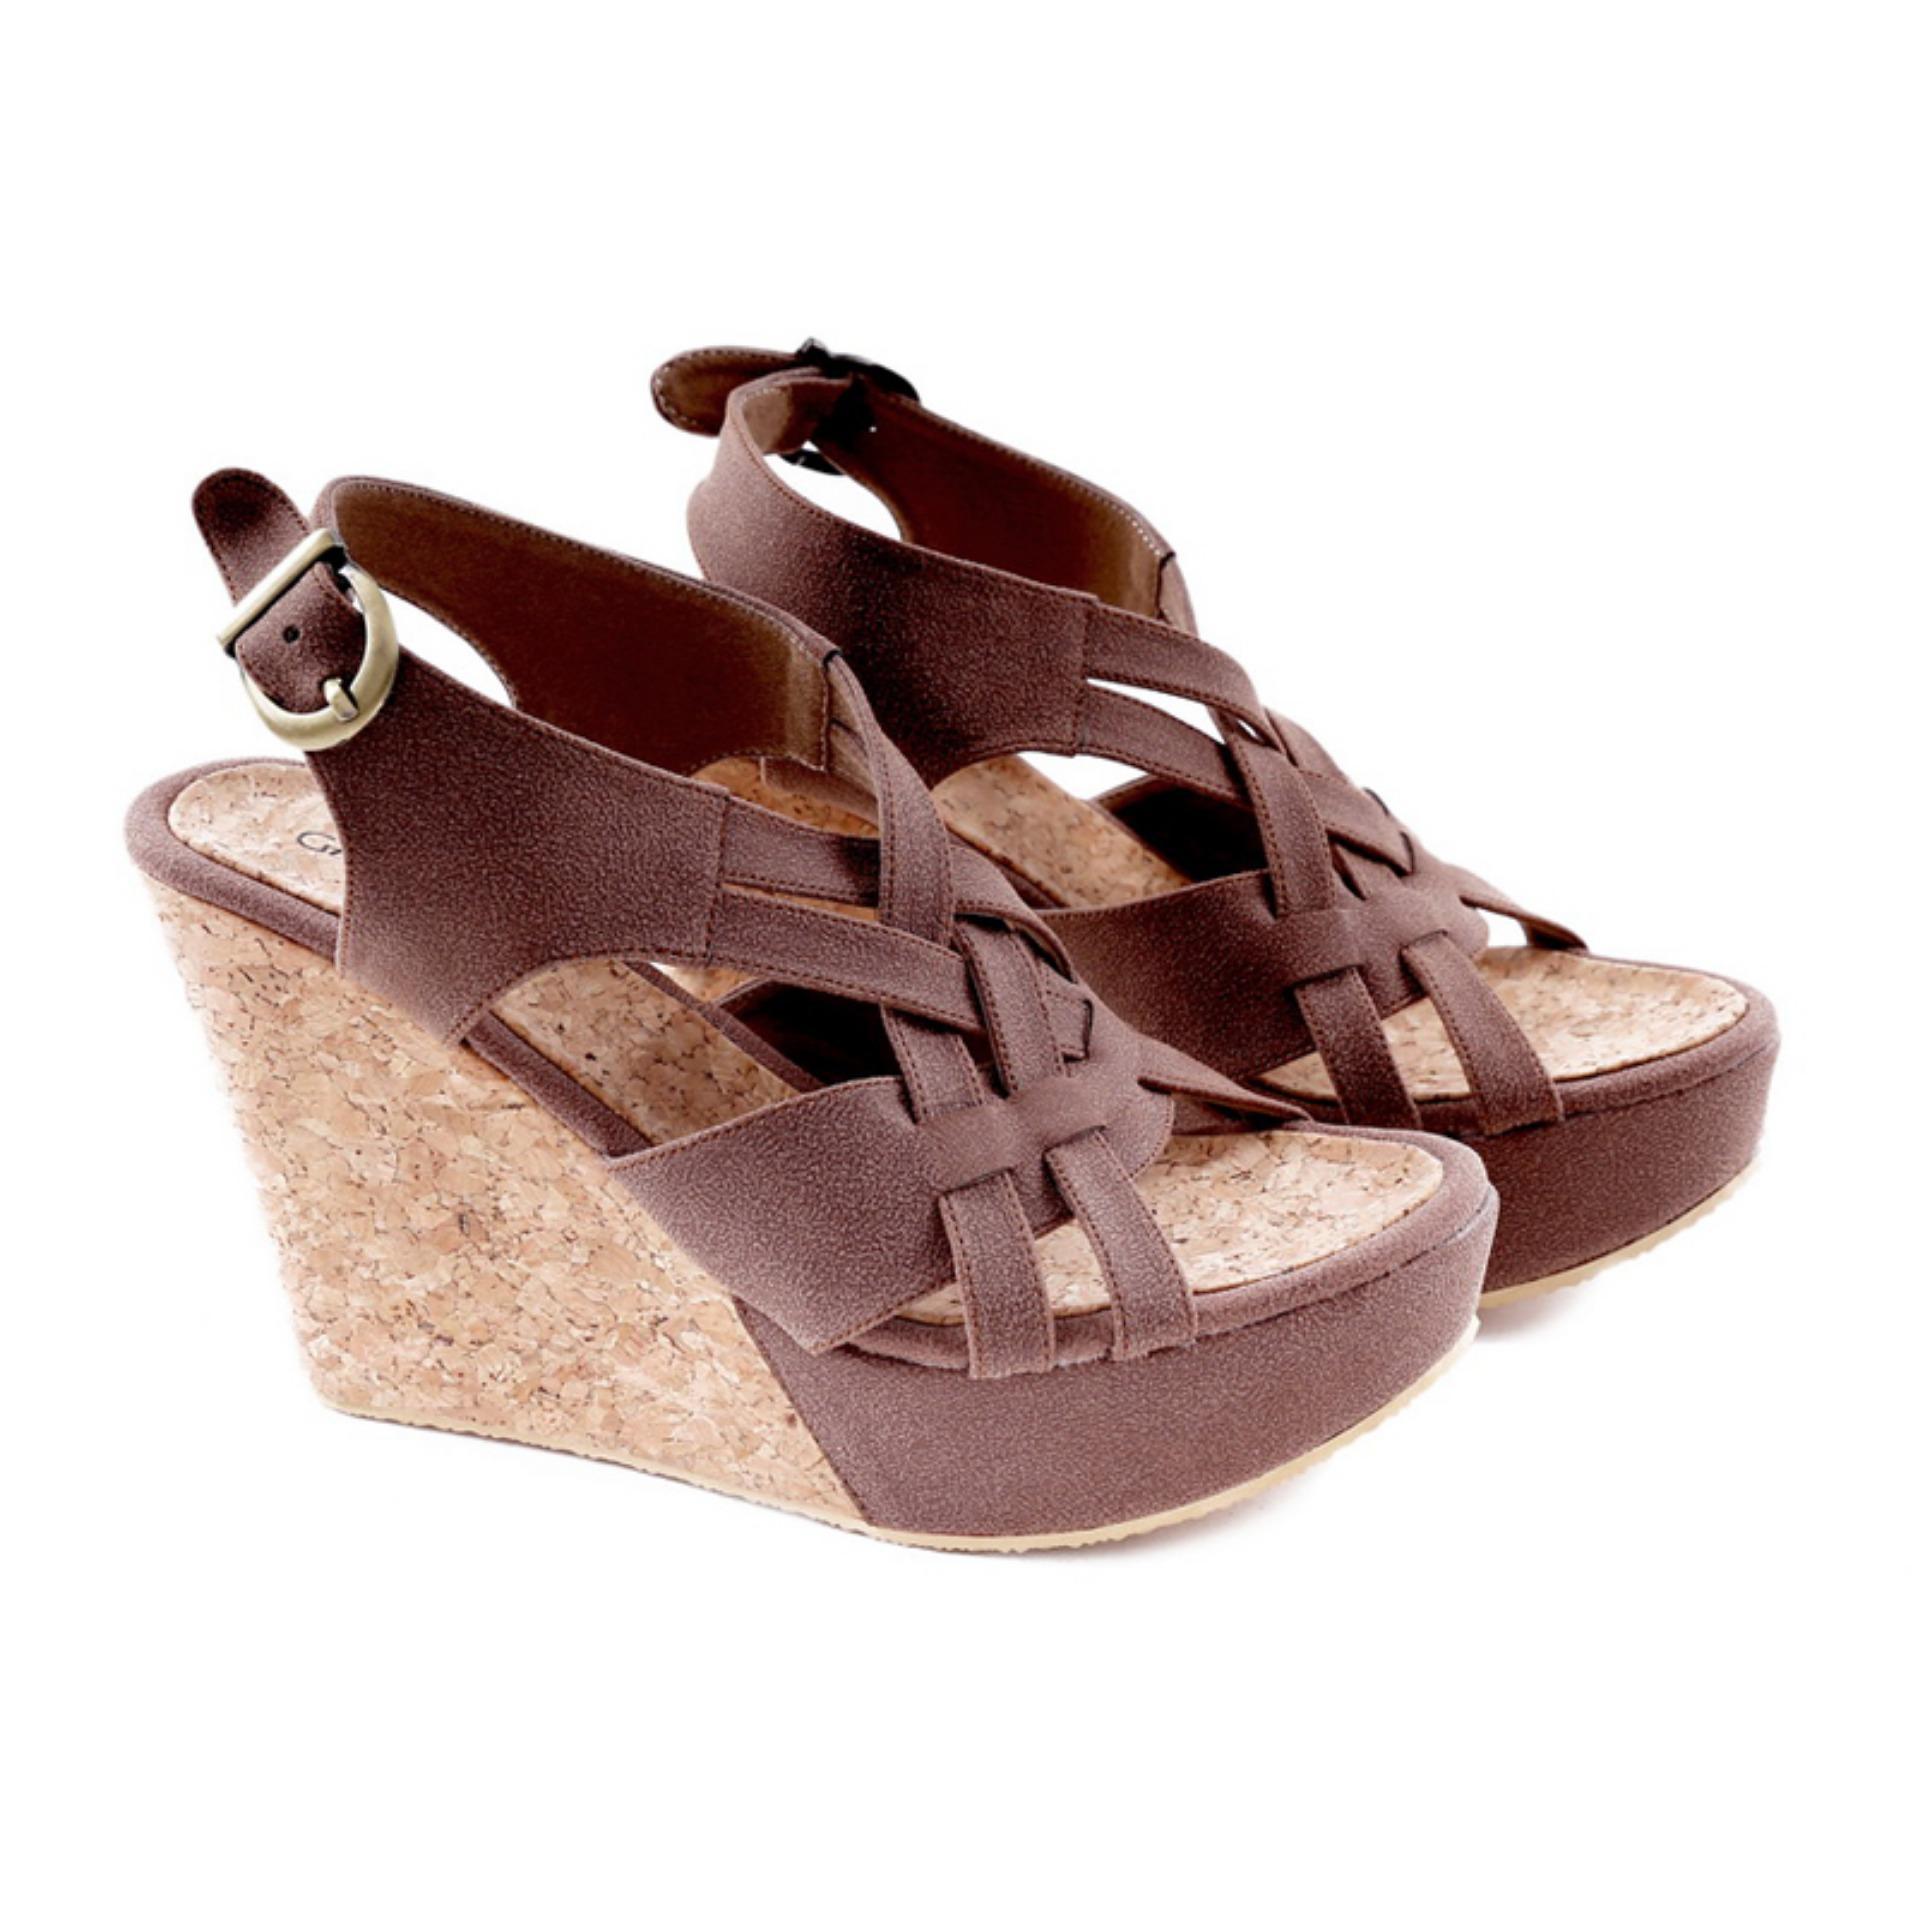 Garucci Gps 5120 Sandal Wedges Wanita Lak Synth Nyaman Hitam Mr91 Cream Shock Price Sepatu Bahan Grd 5056 Penjualan